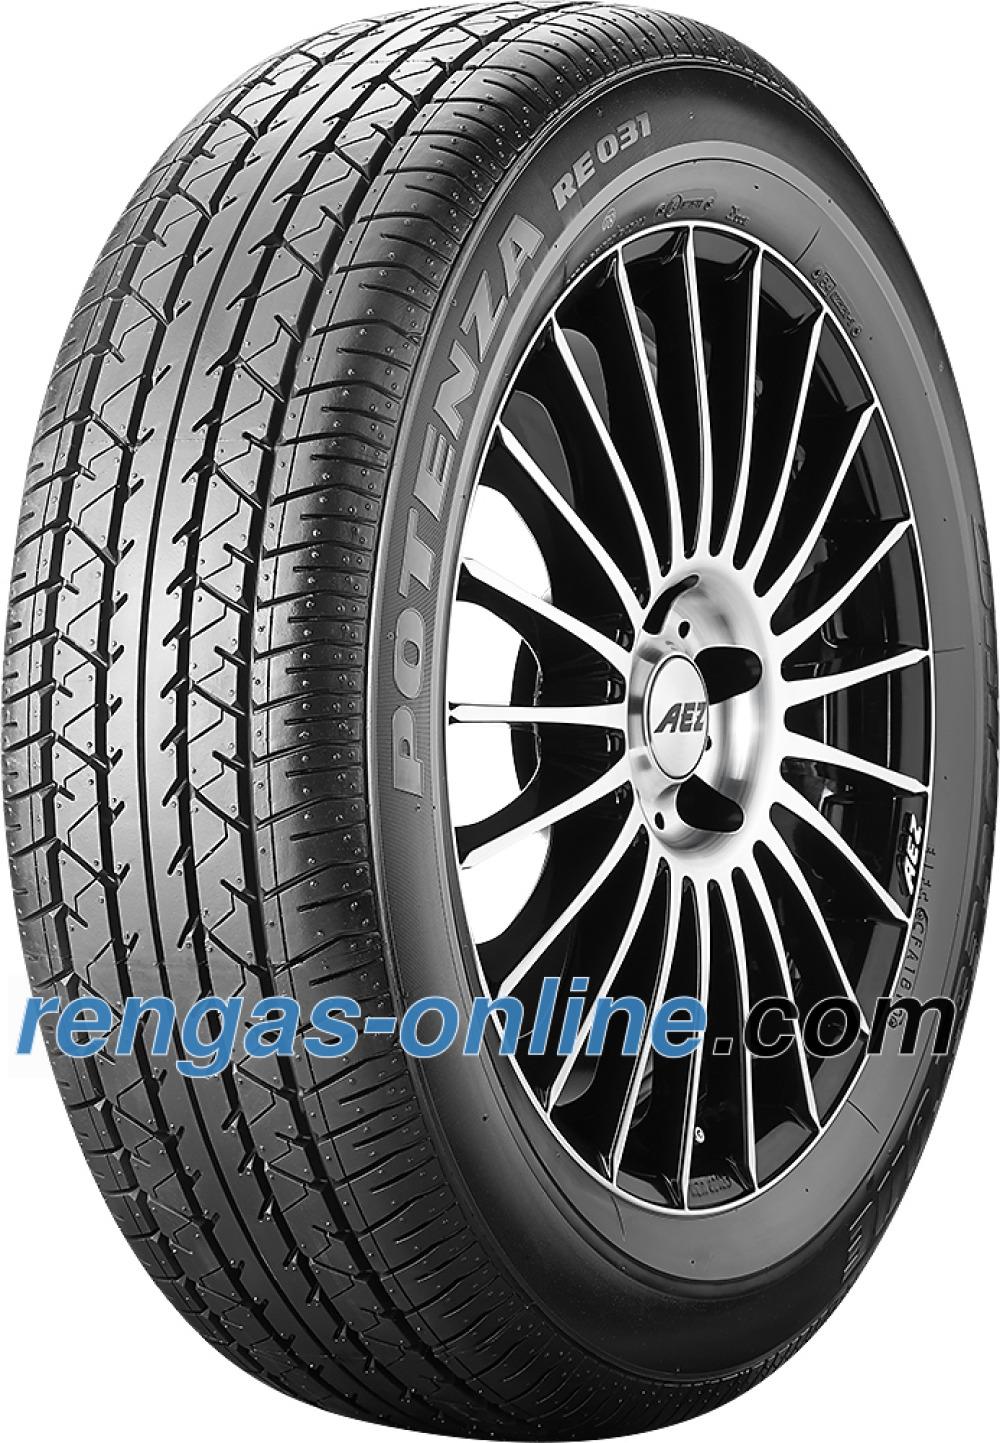 bridgestone-potenza-re-031-23555-r18-99v